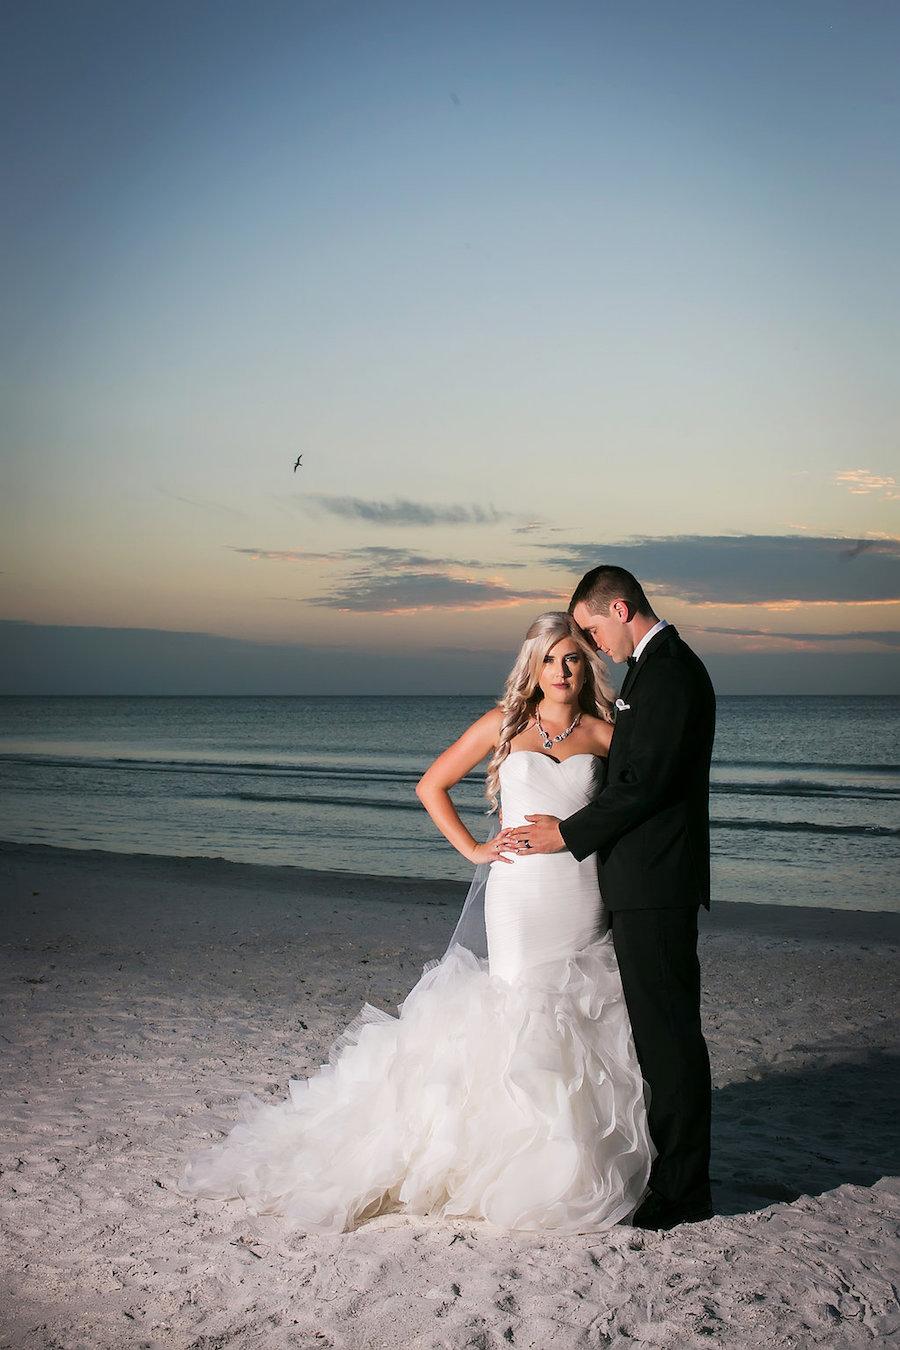 St Pete Beach Bride and Groom Wedding Portrait   Pronovias Bridal Wedding Dress   Don CeSar Wedding   St Pete Wedding Photographer Limelight Photography